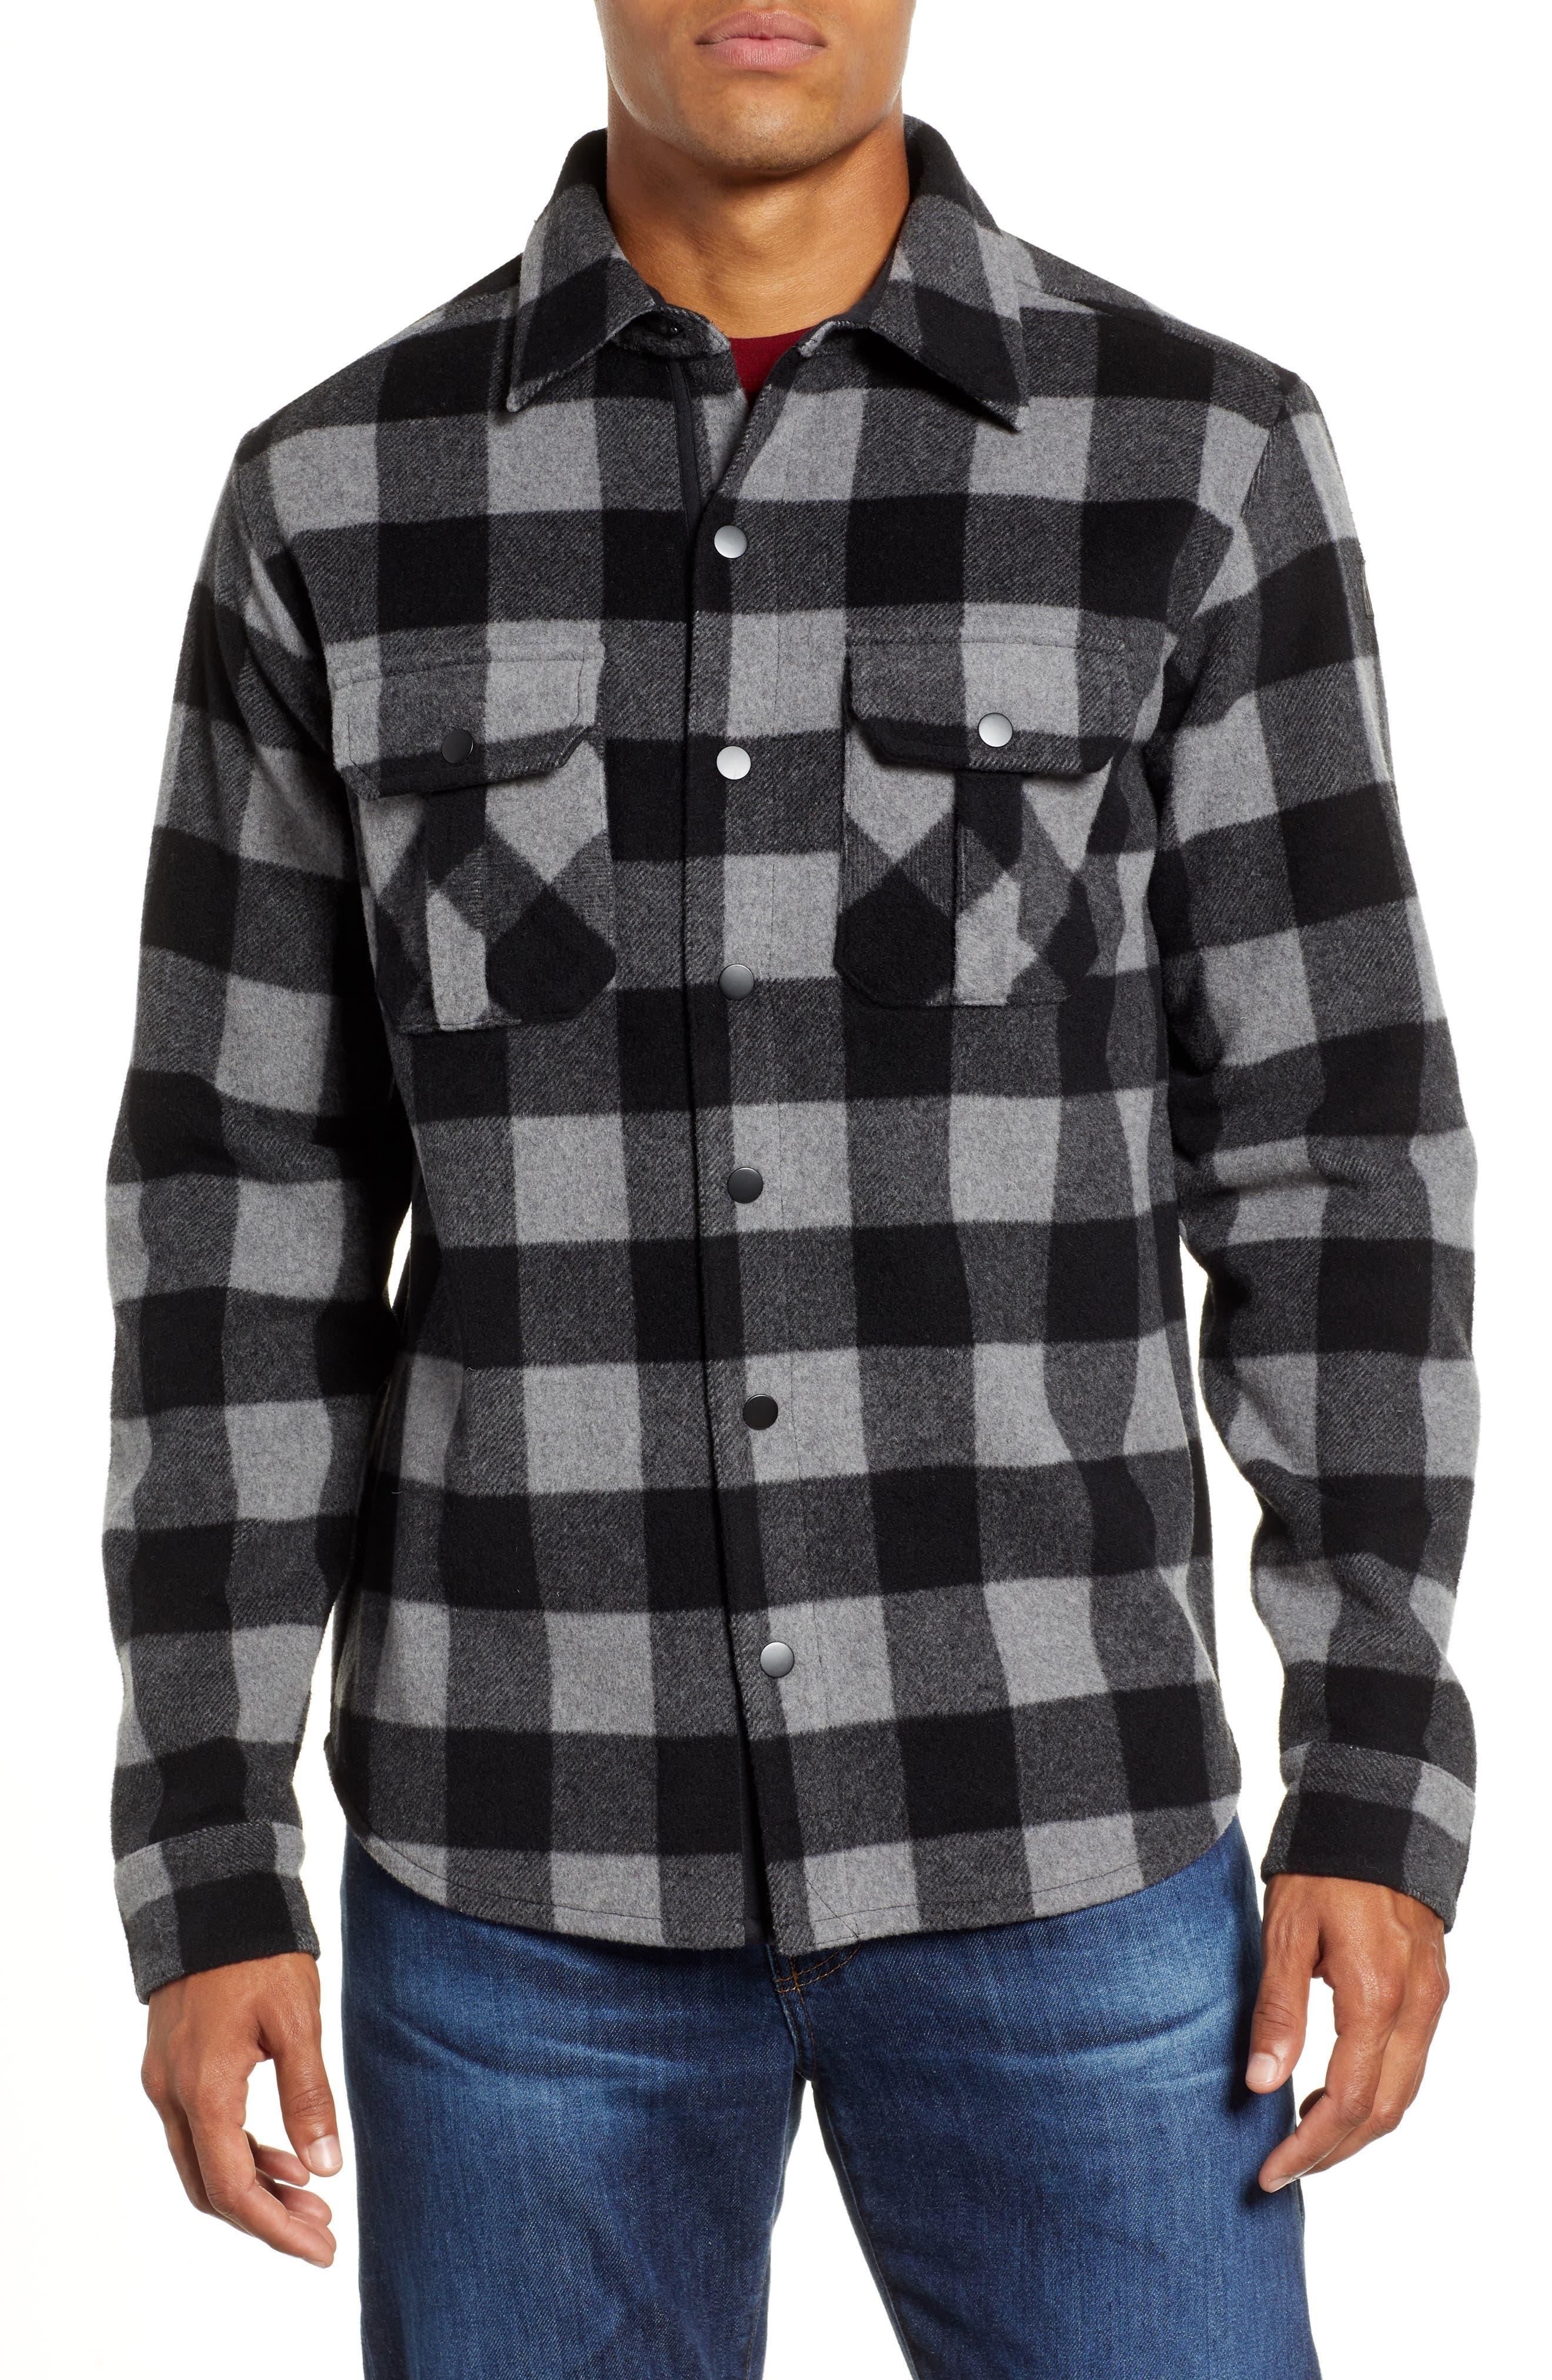 Anchor Line Flannel Shirt Jacket,                             Alternate thumbnail 2, color,                             MEDIUM GREY